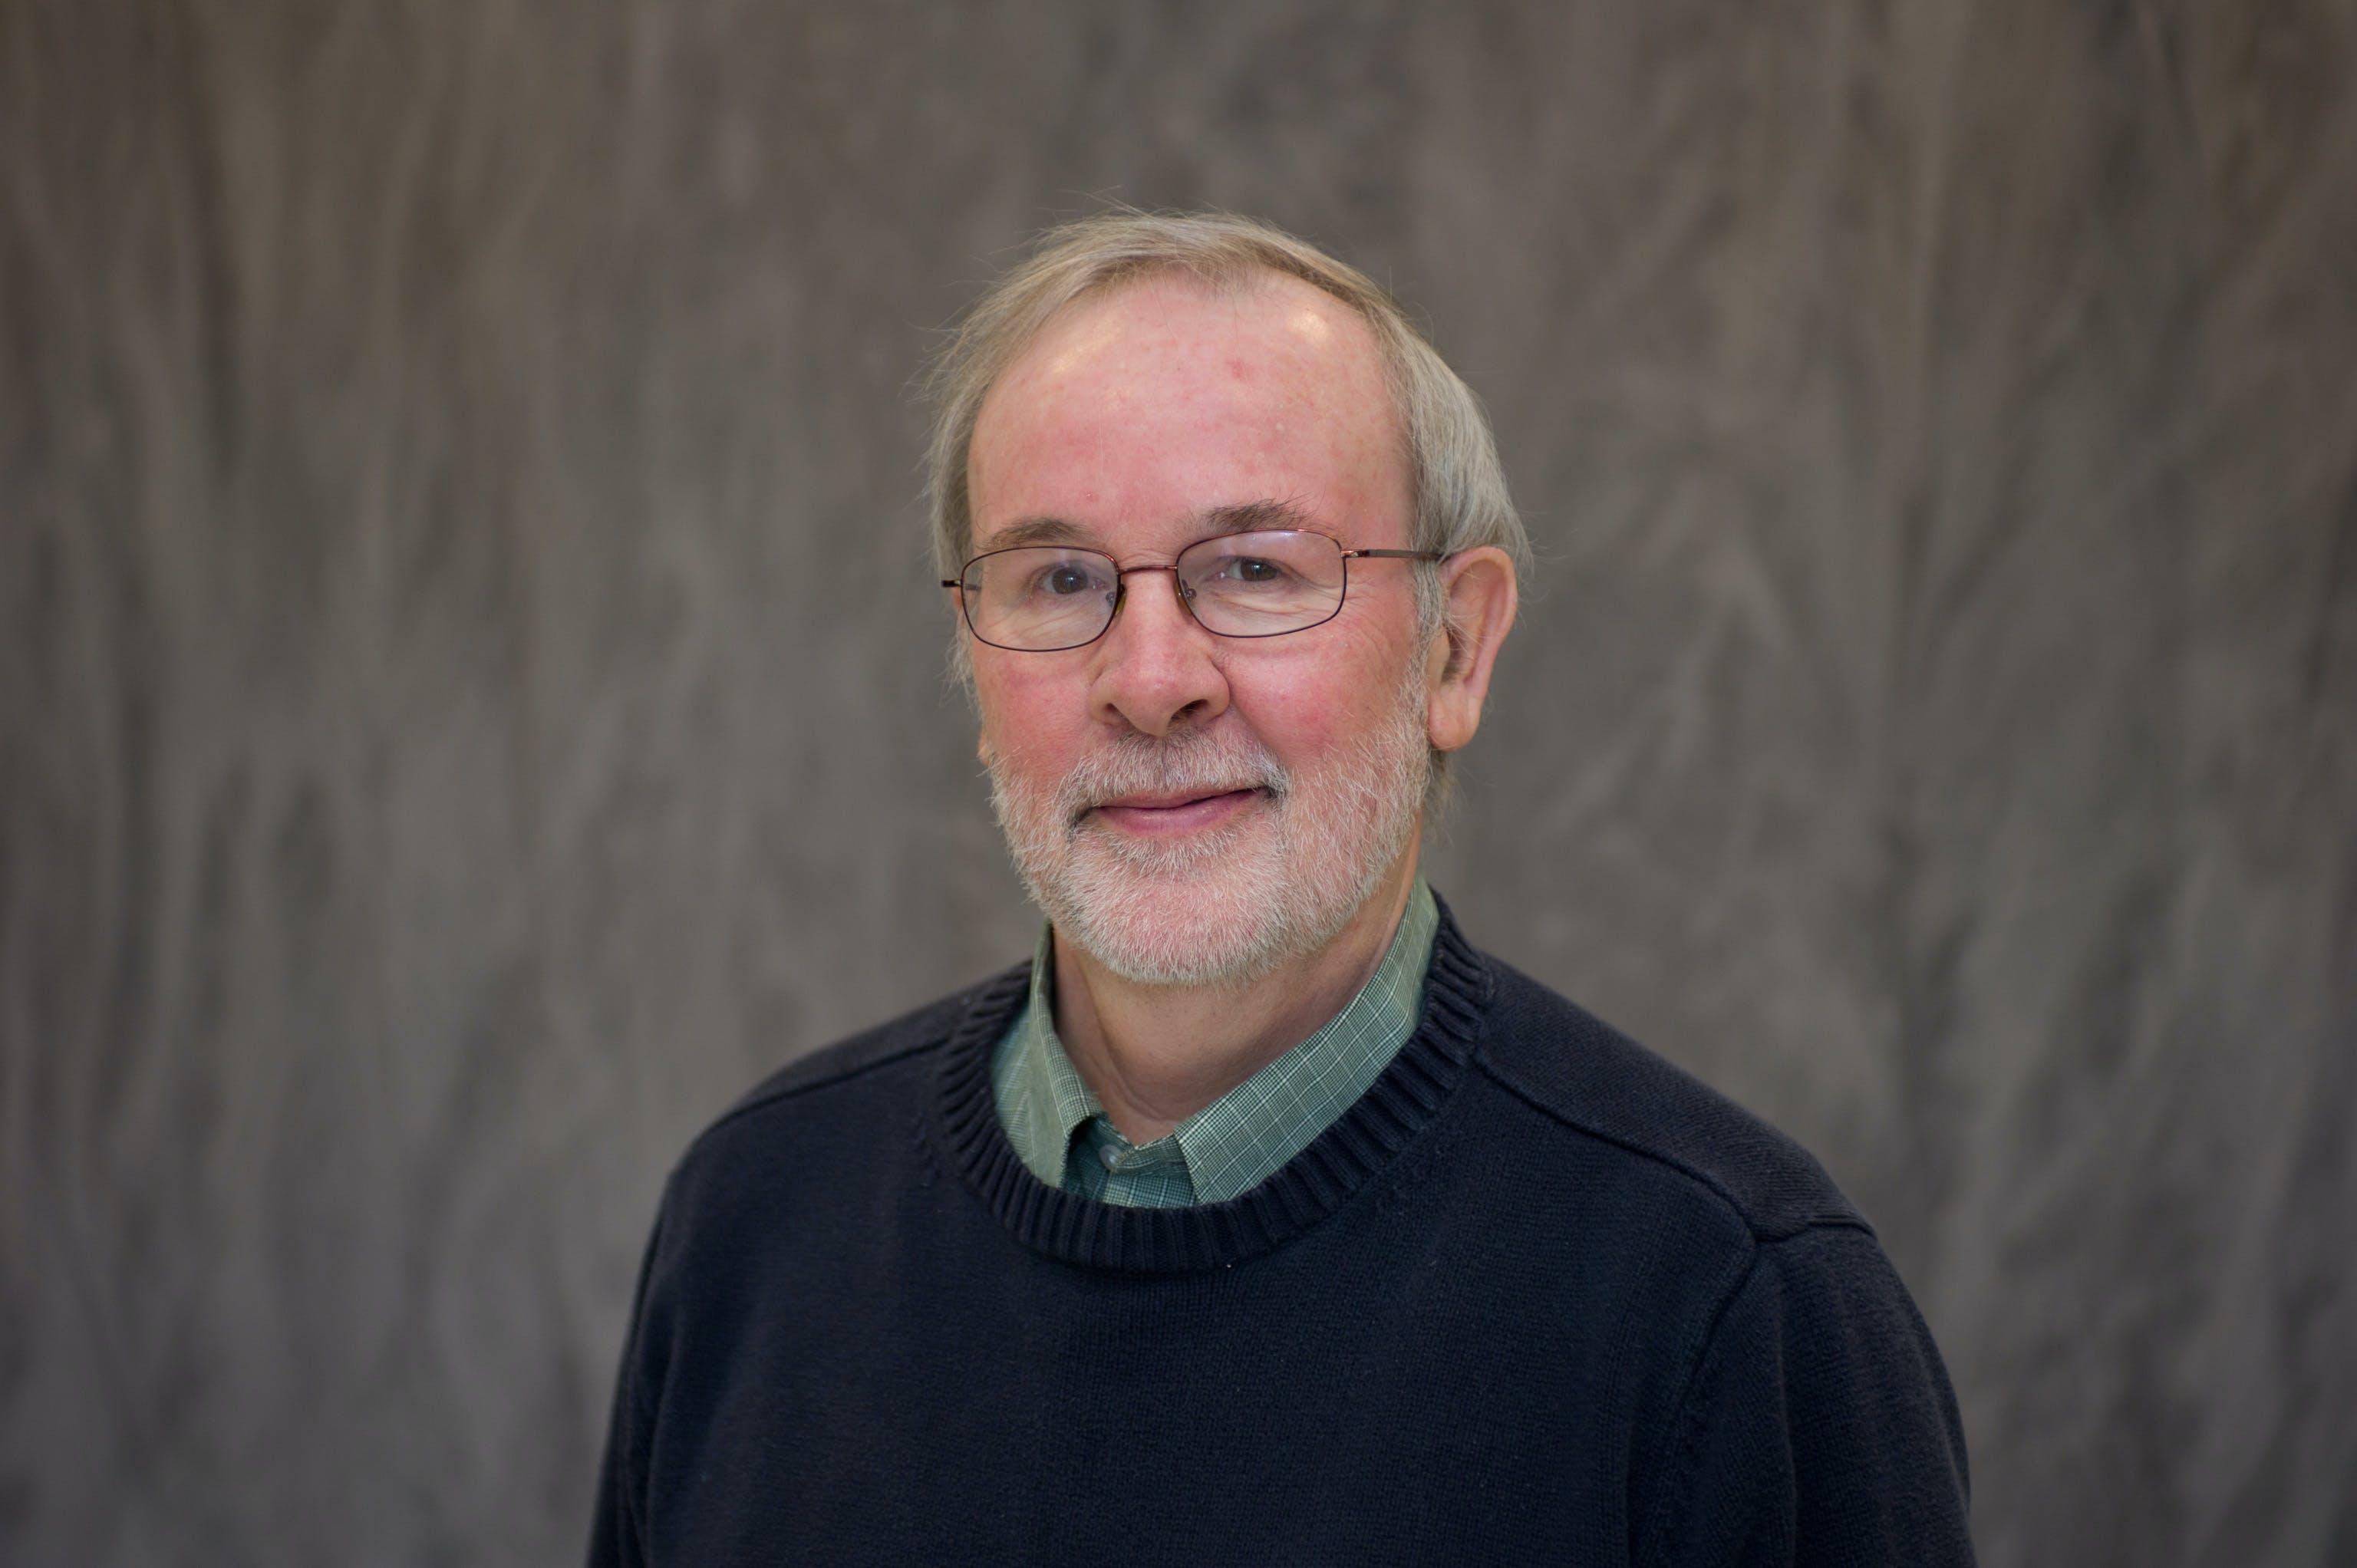 Dr. Philip Roberts